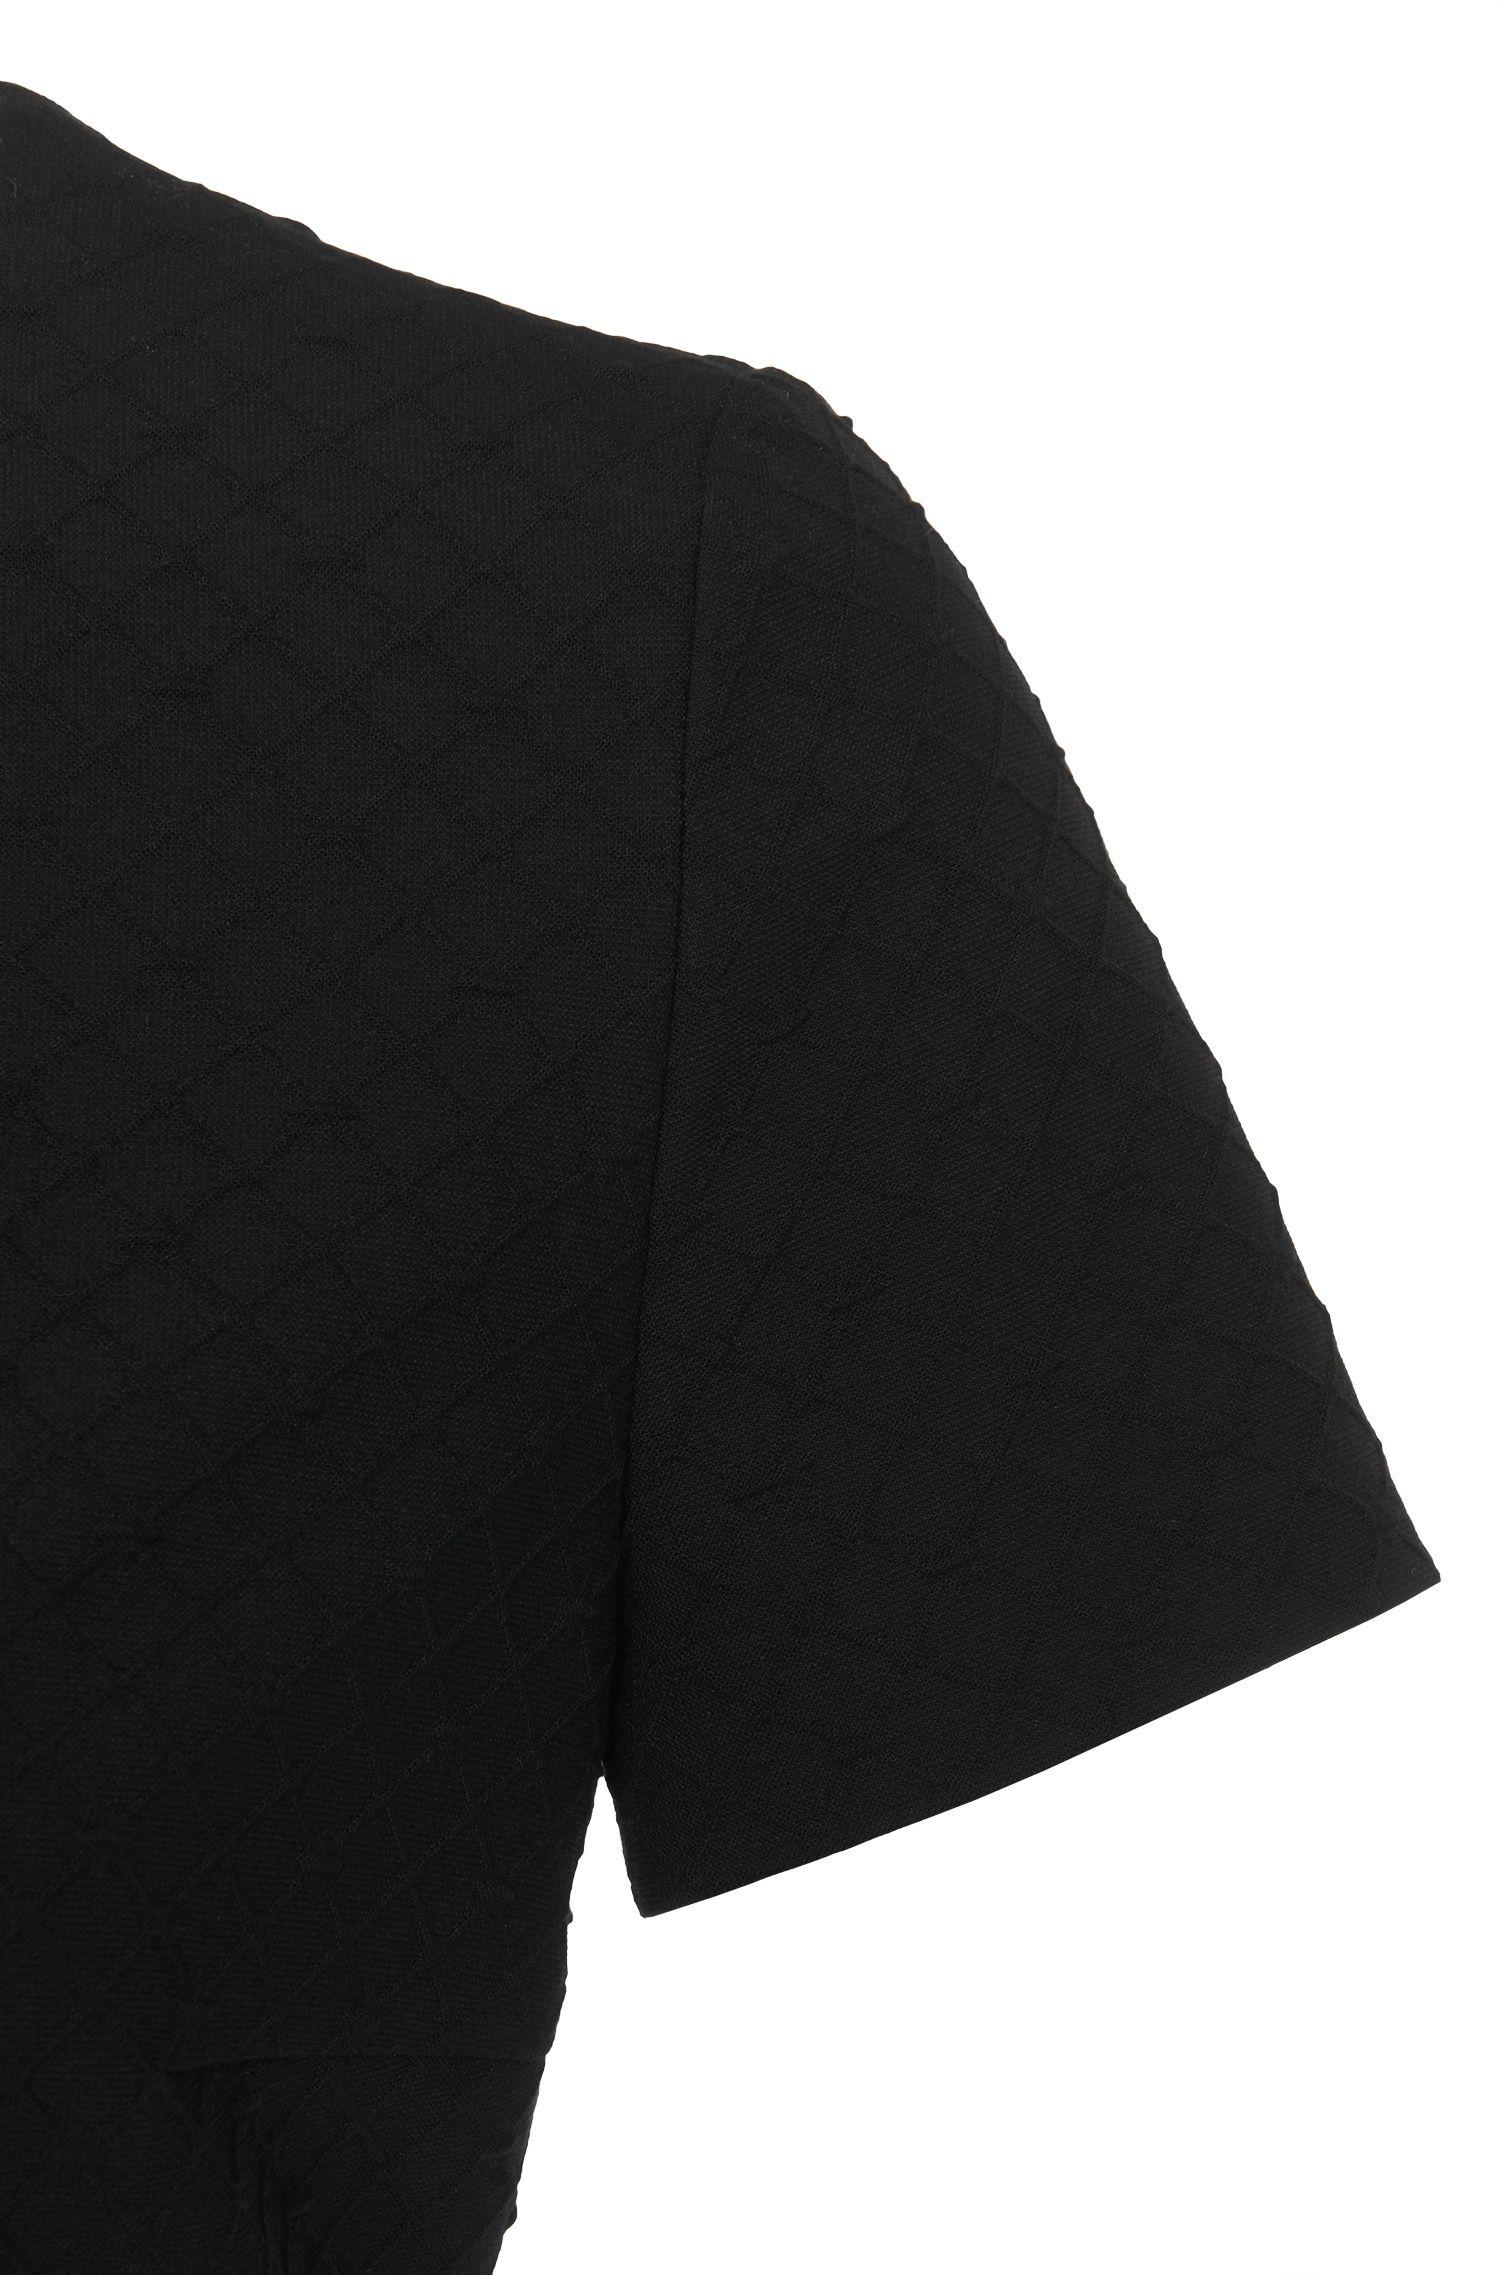 Kurzarm-Kleid aus strukturiertem Gewebe: 'Kaorie'